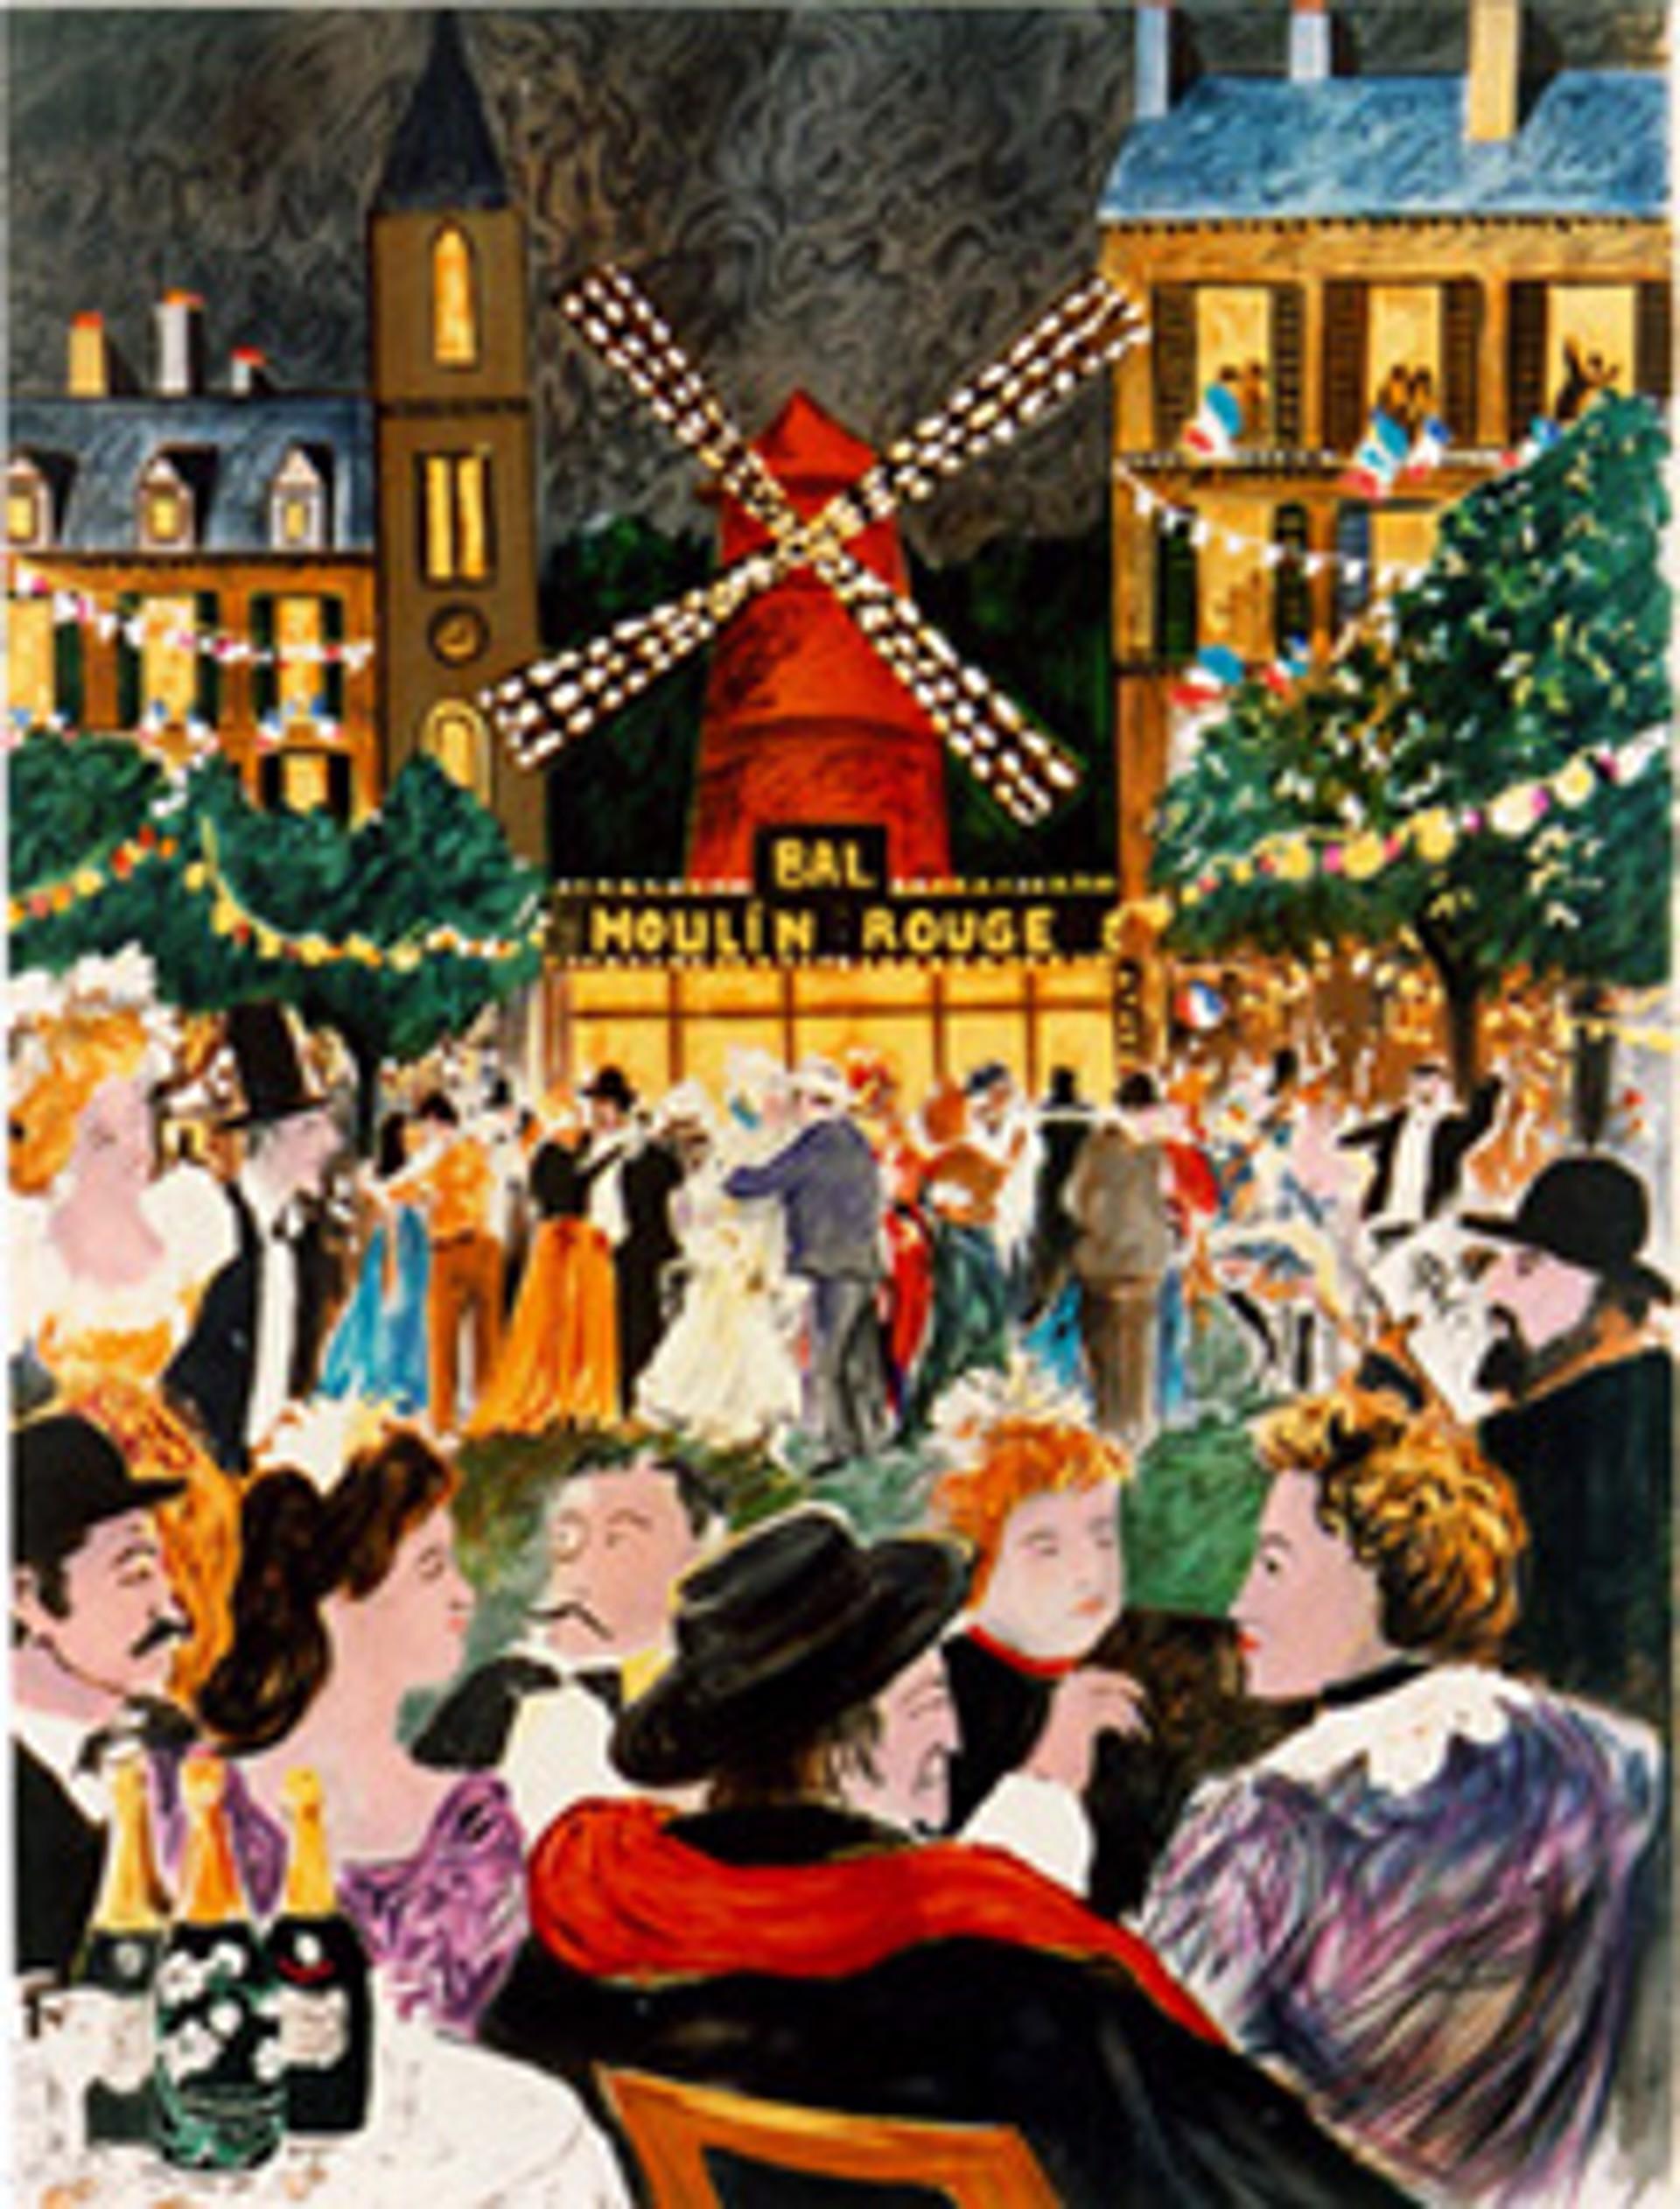 Moulin Rouge by Guy Buffet